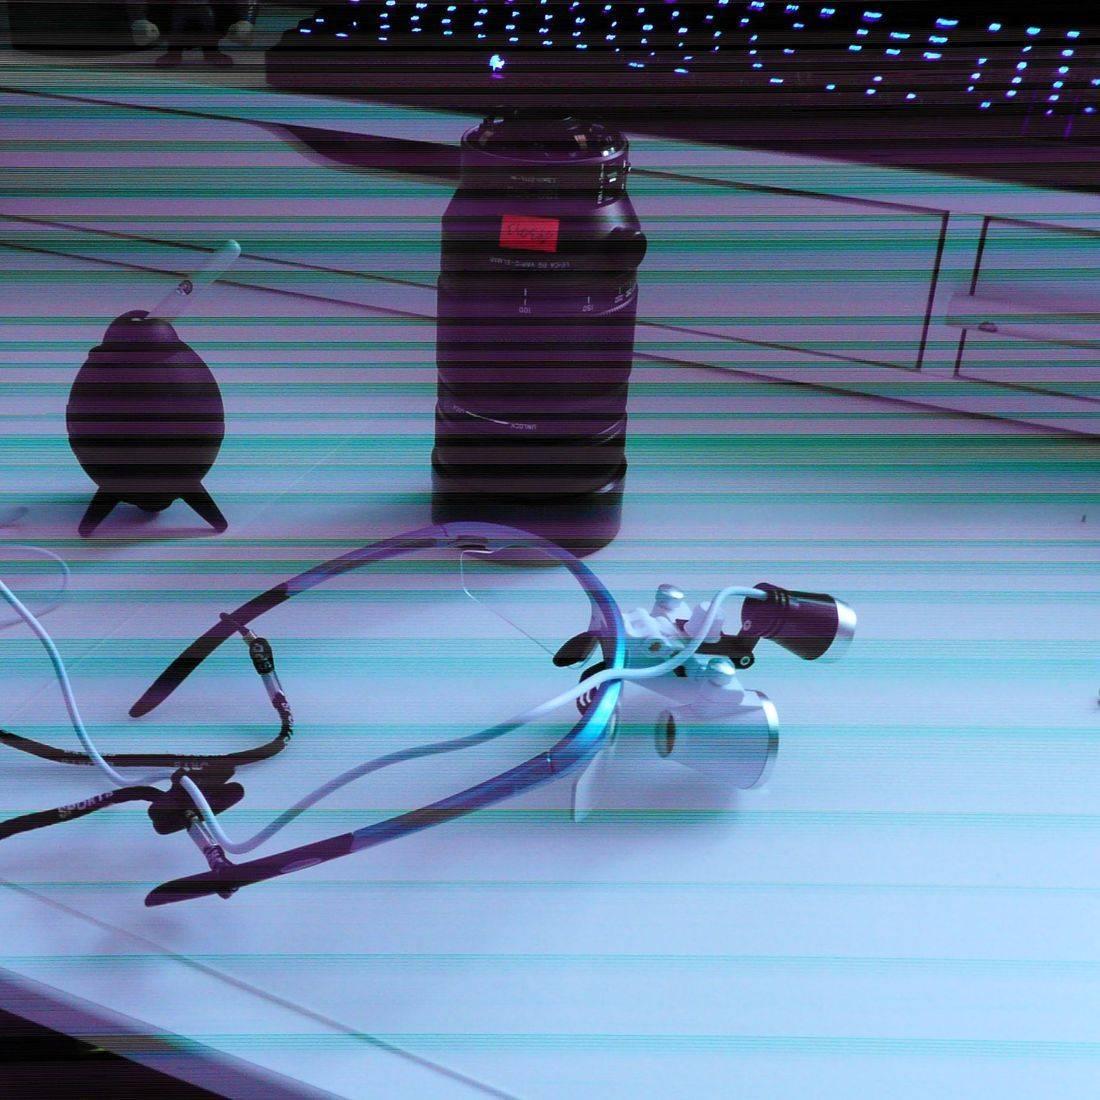 Panasoni Lumix DMC-TZ3 Digital Camera